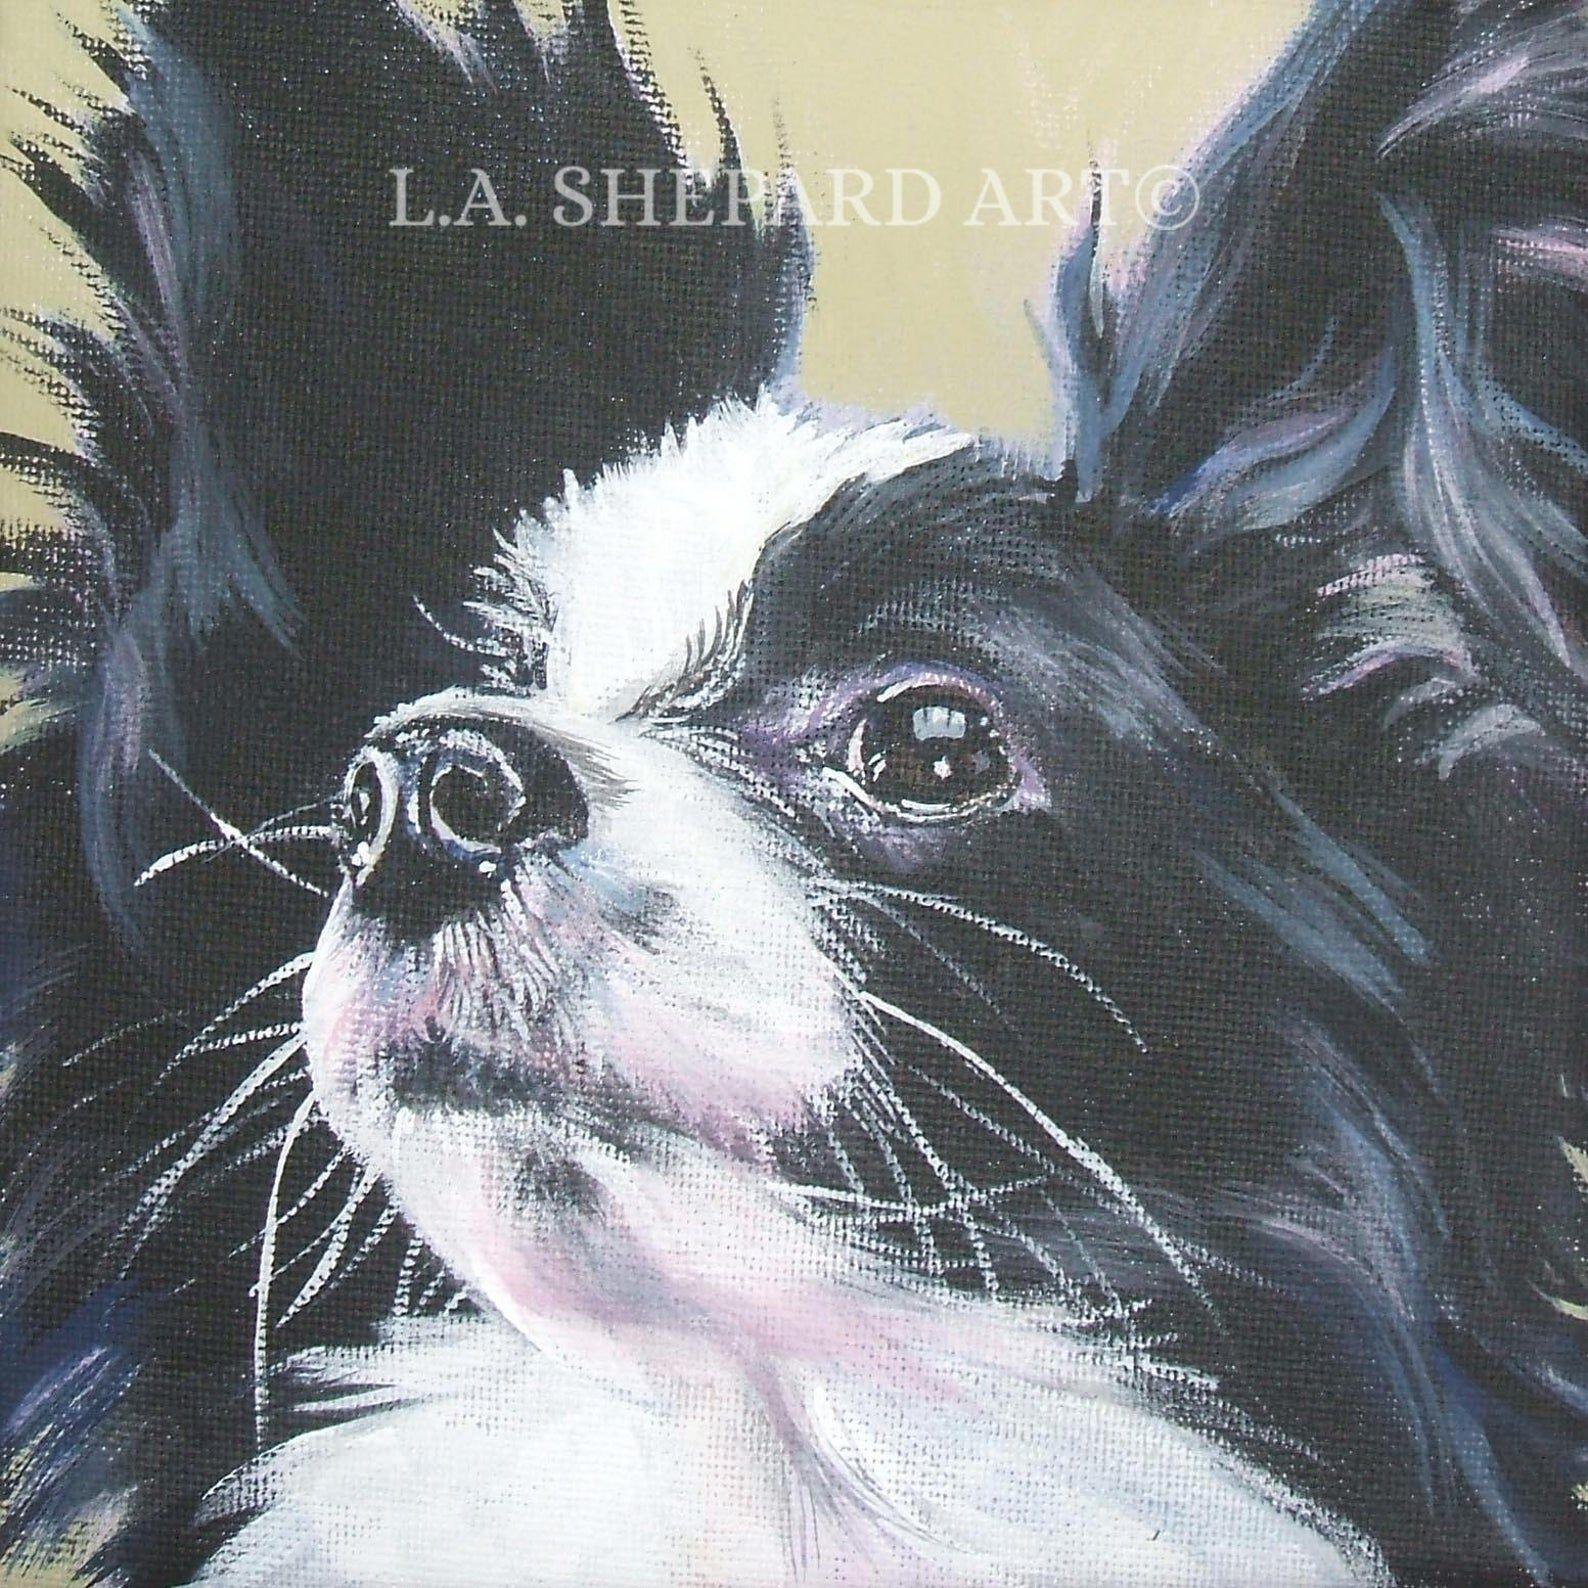 Papillon Dog Portrait Art Canvas Print Of Lashepard Painting Etsy In 2020 Papillon Dog Dog Artist Dog Print Art [ 1588 x 1588 Pixel ]